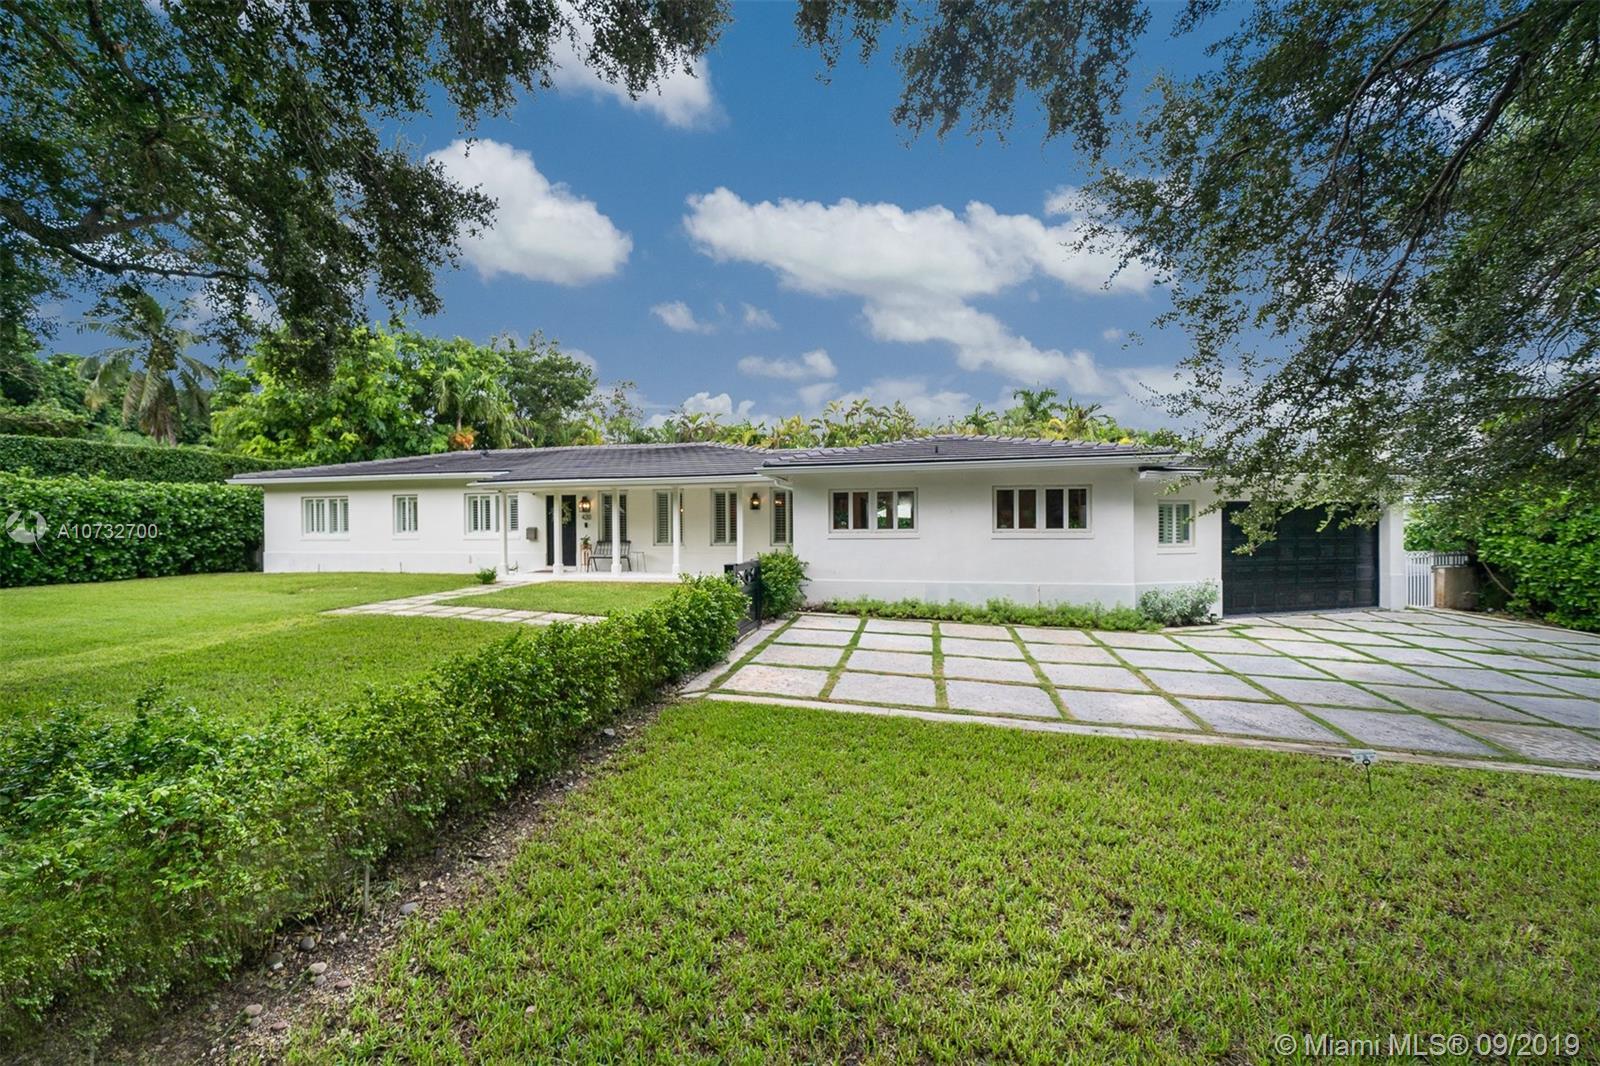 South Miami - 420 Tivoli Ave, Coral Gables, FL 33143